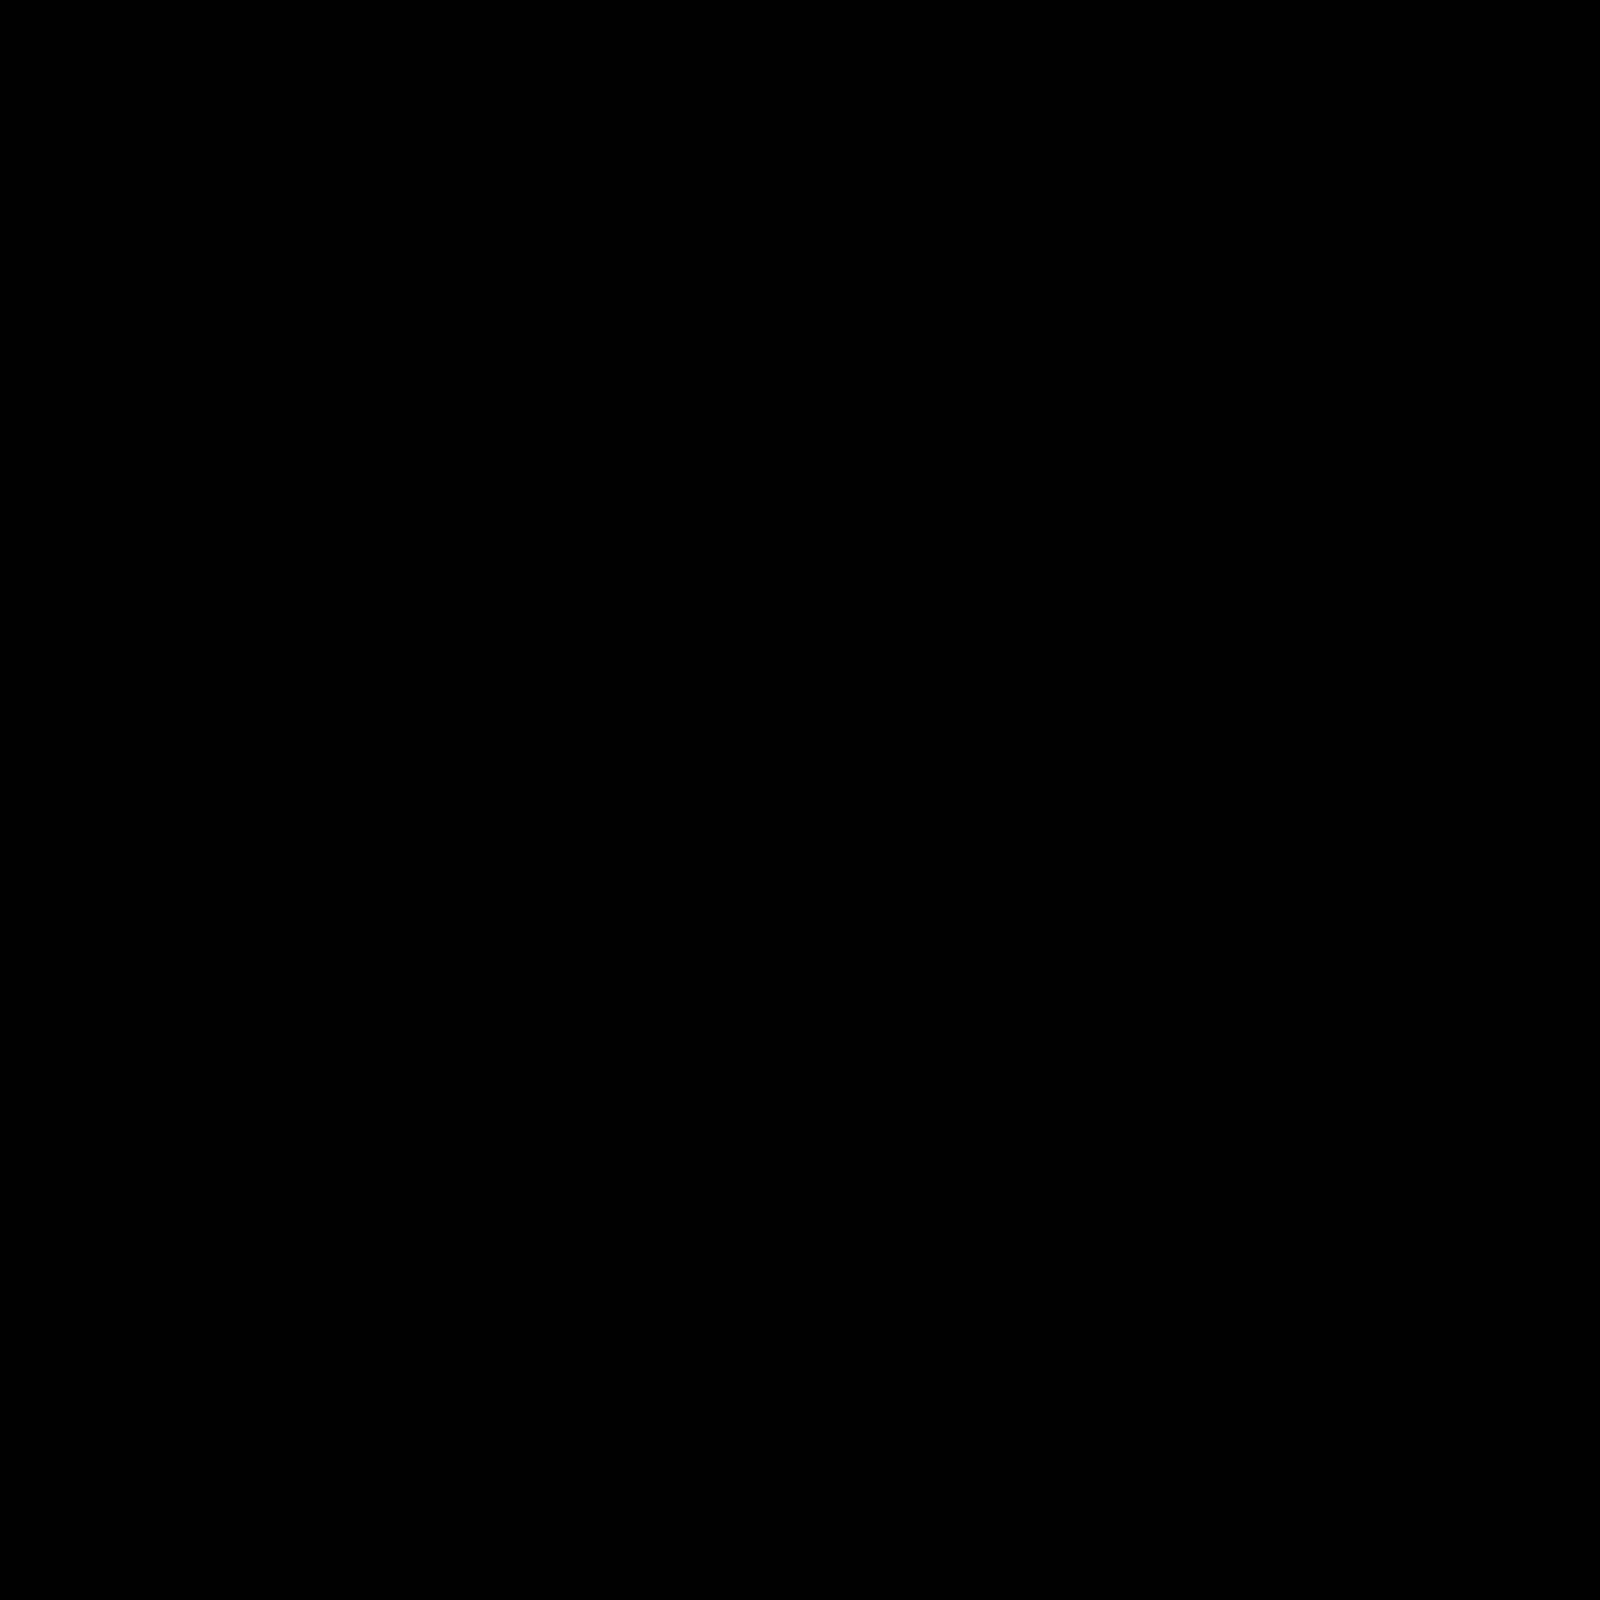 Broken Bottle icon